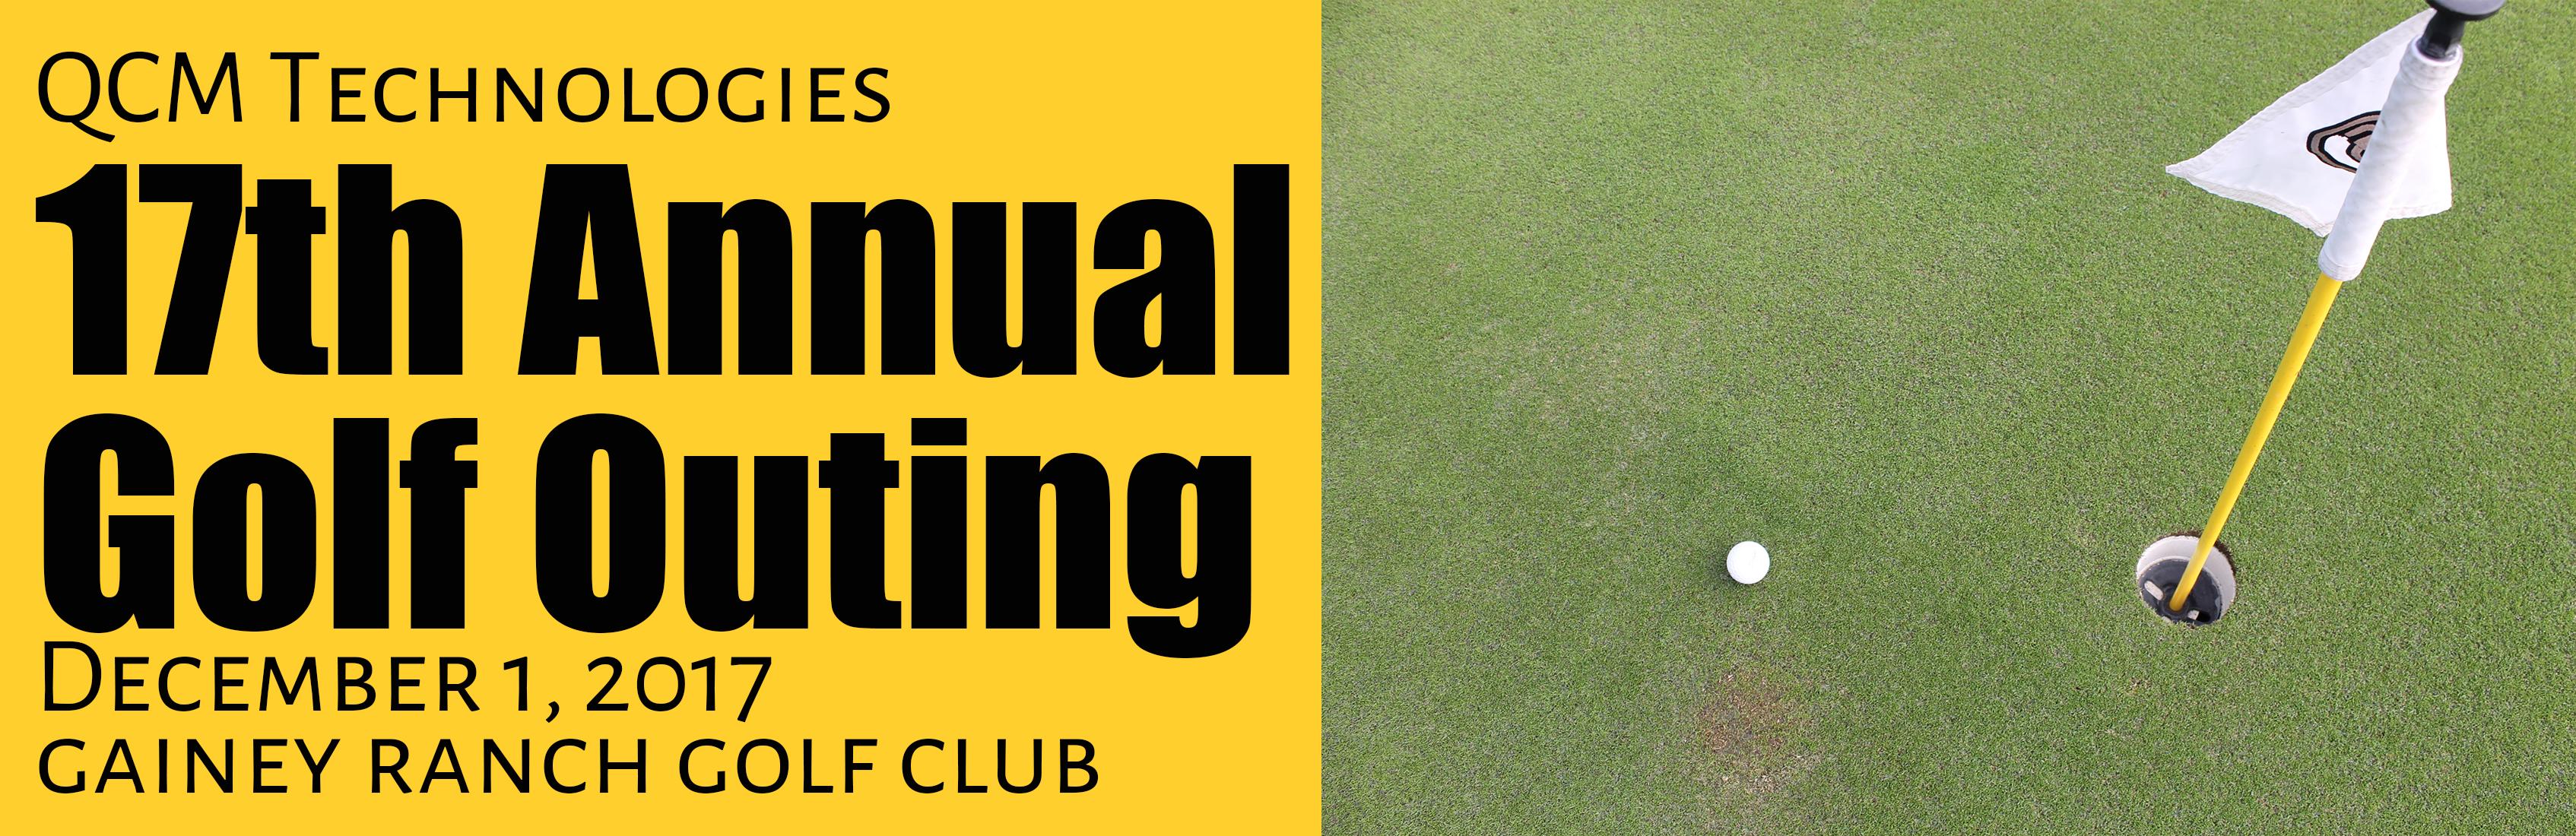 QCM Technologies 17th Annual Golf Outing